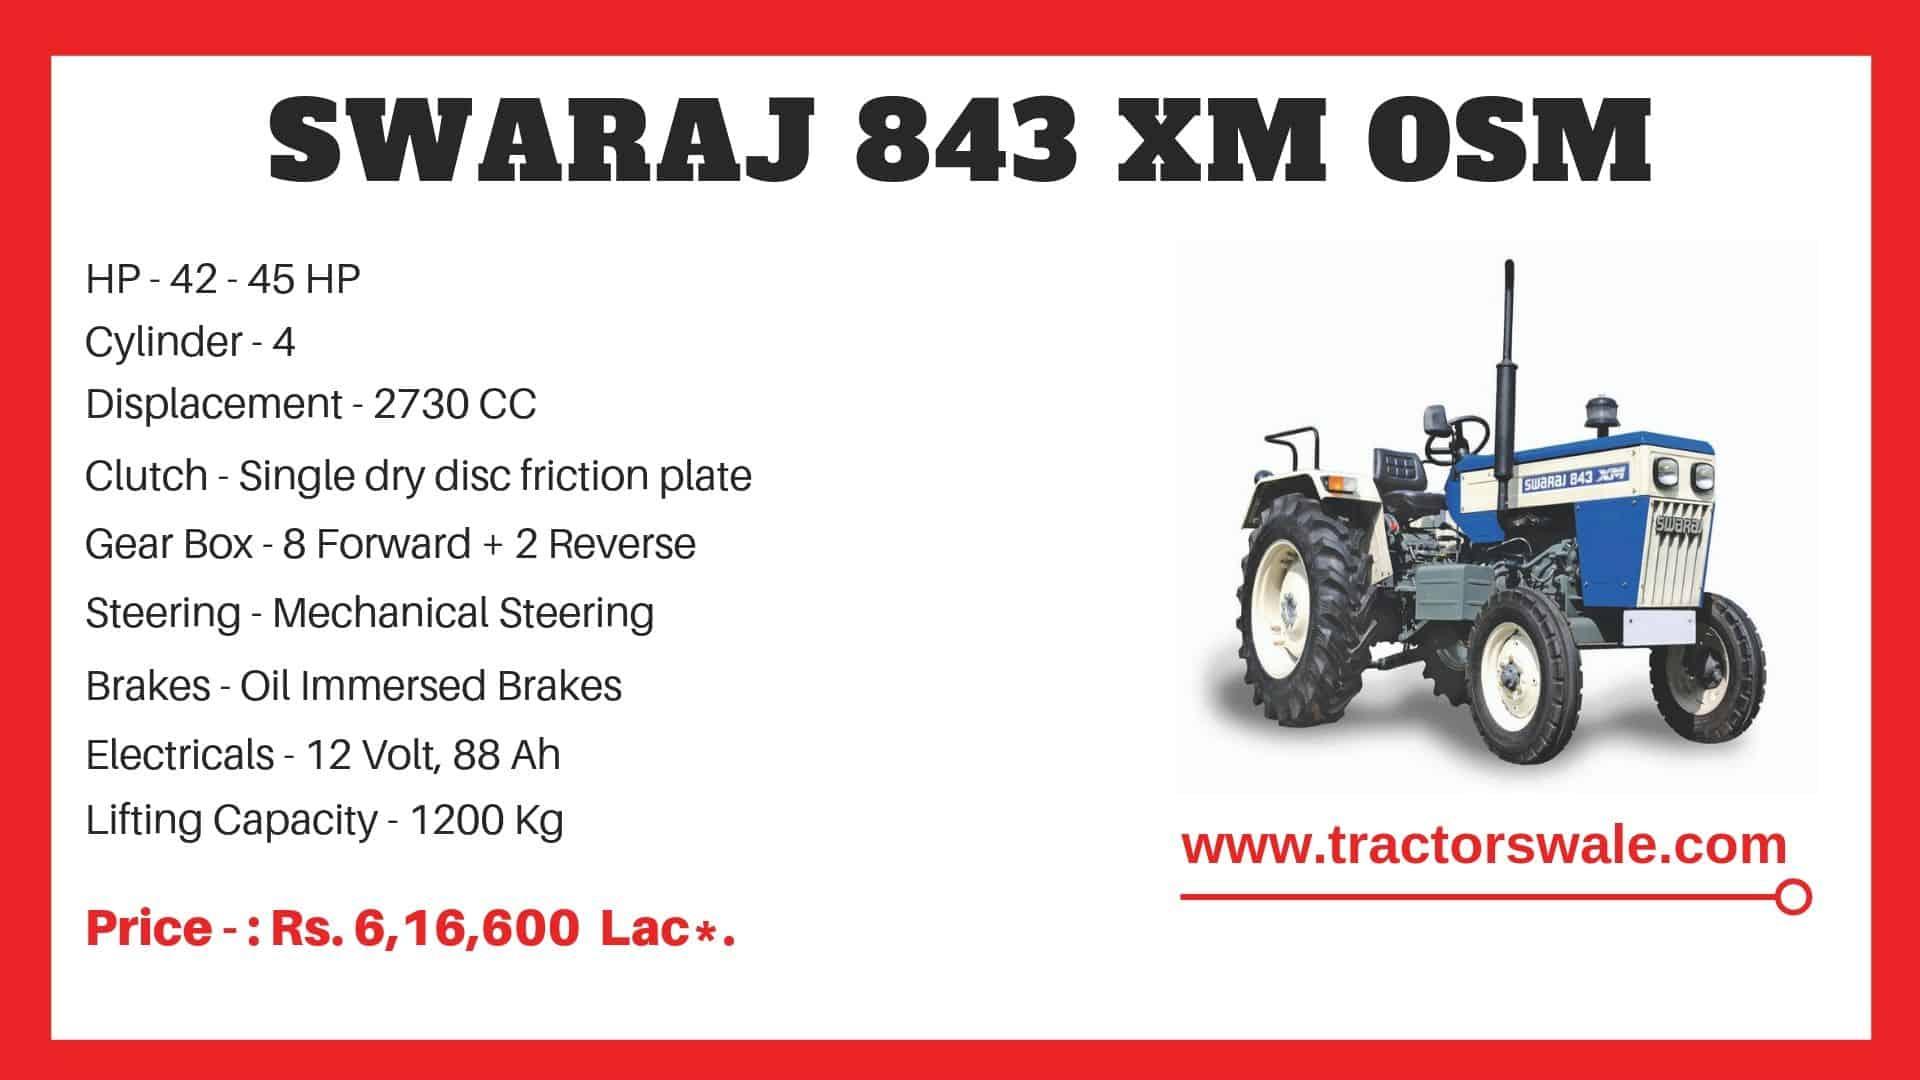 Specification of Swaraj 843 XM OSM Tractor